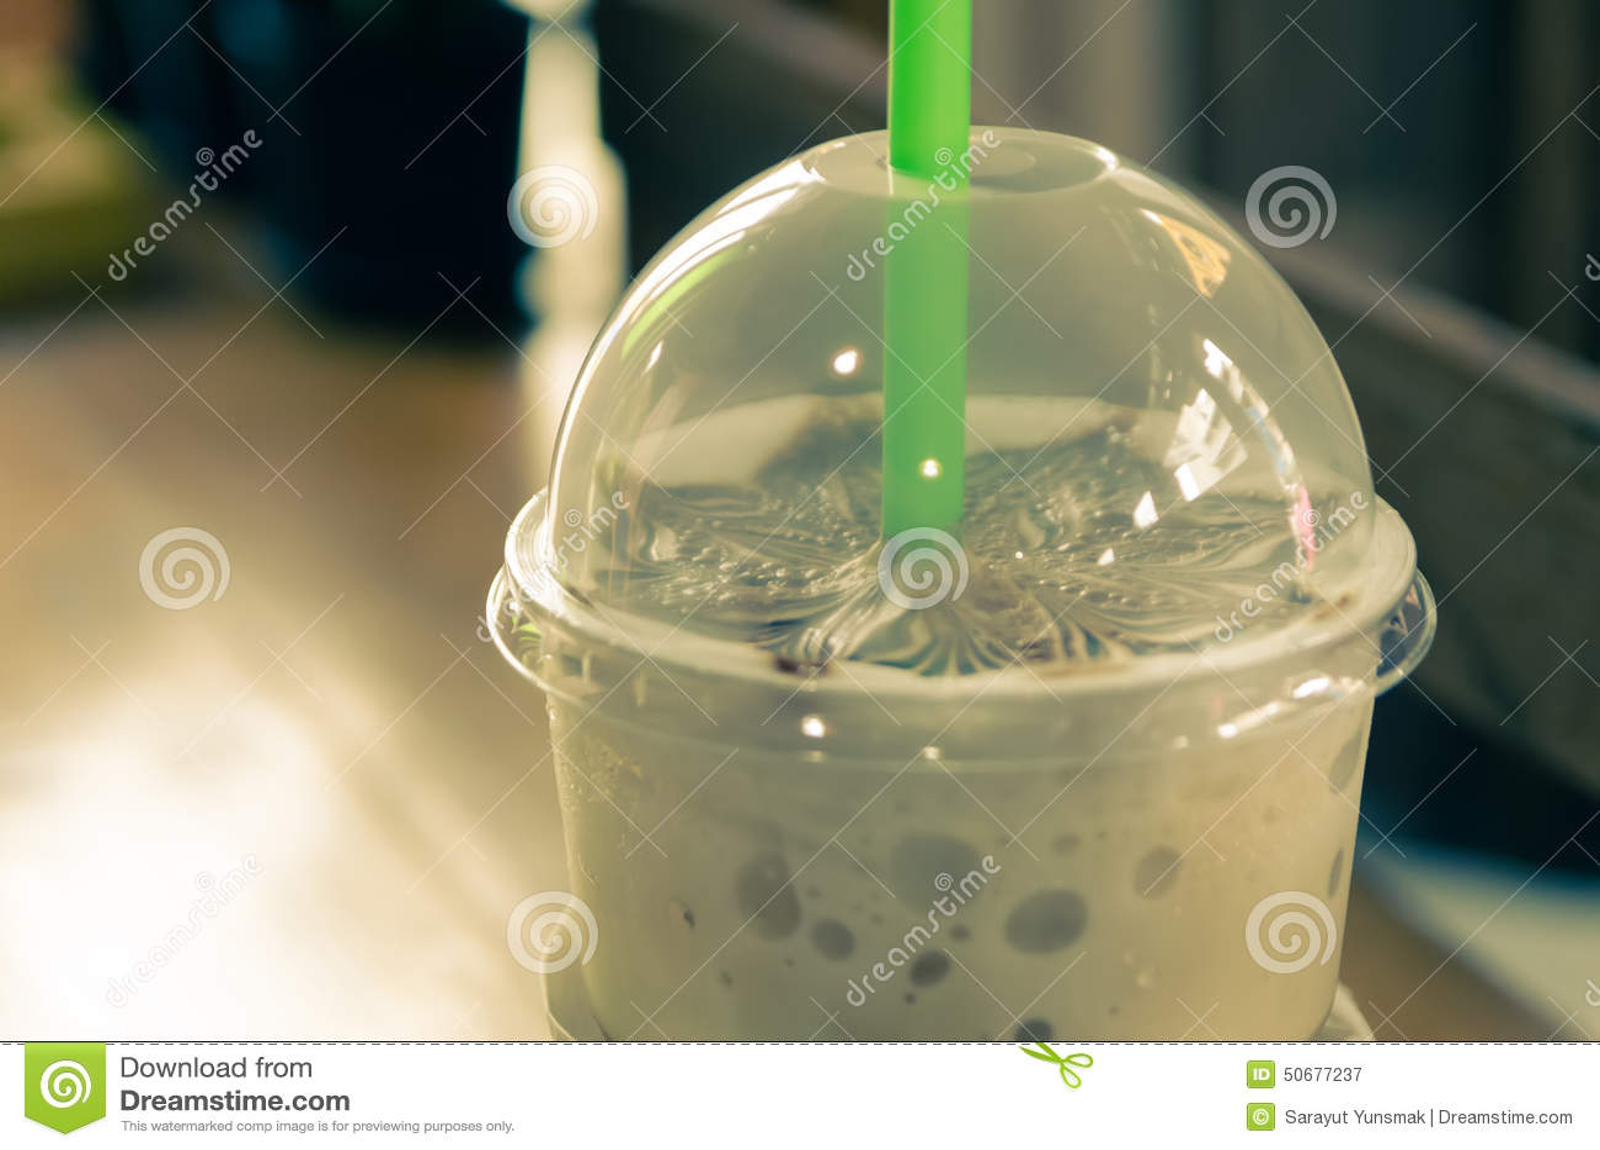 Download 拿铁艺术咖啡过程葡萄酒样式 库存图片. 图片 包括有 关闭, 框架, latte, 打赌的人, 咖啡, 细分 - 50677237